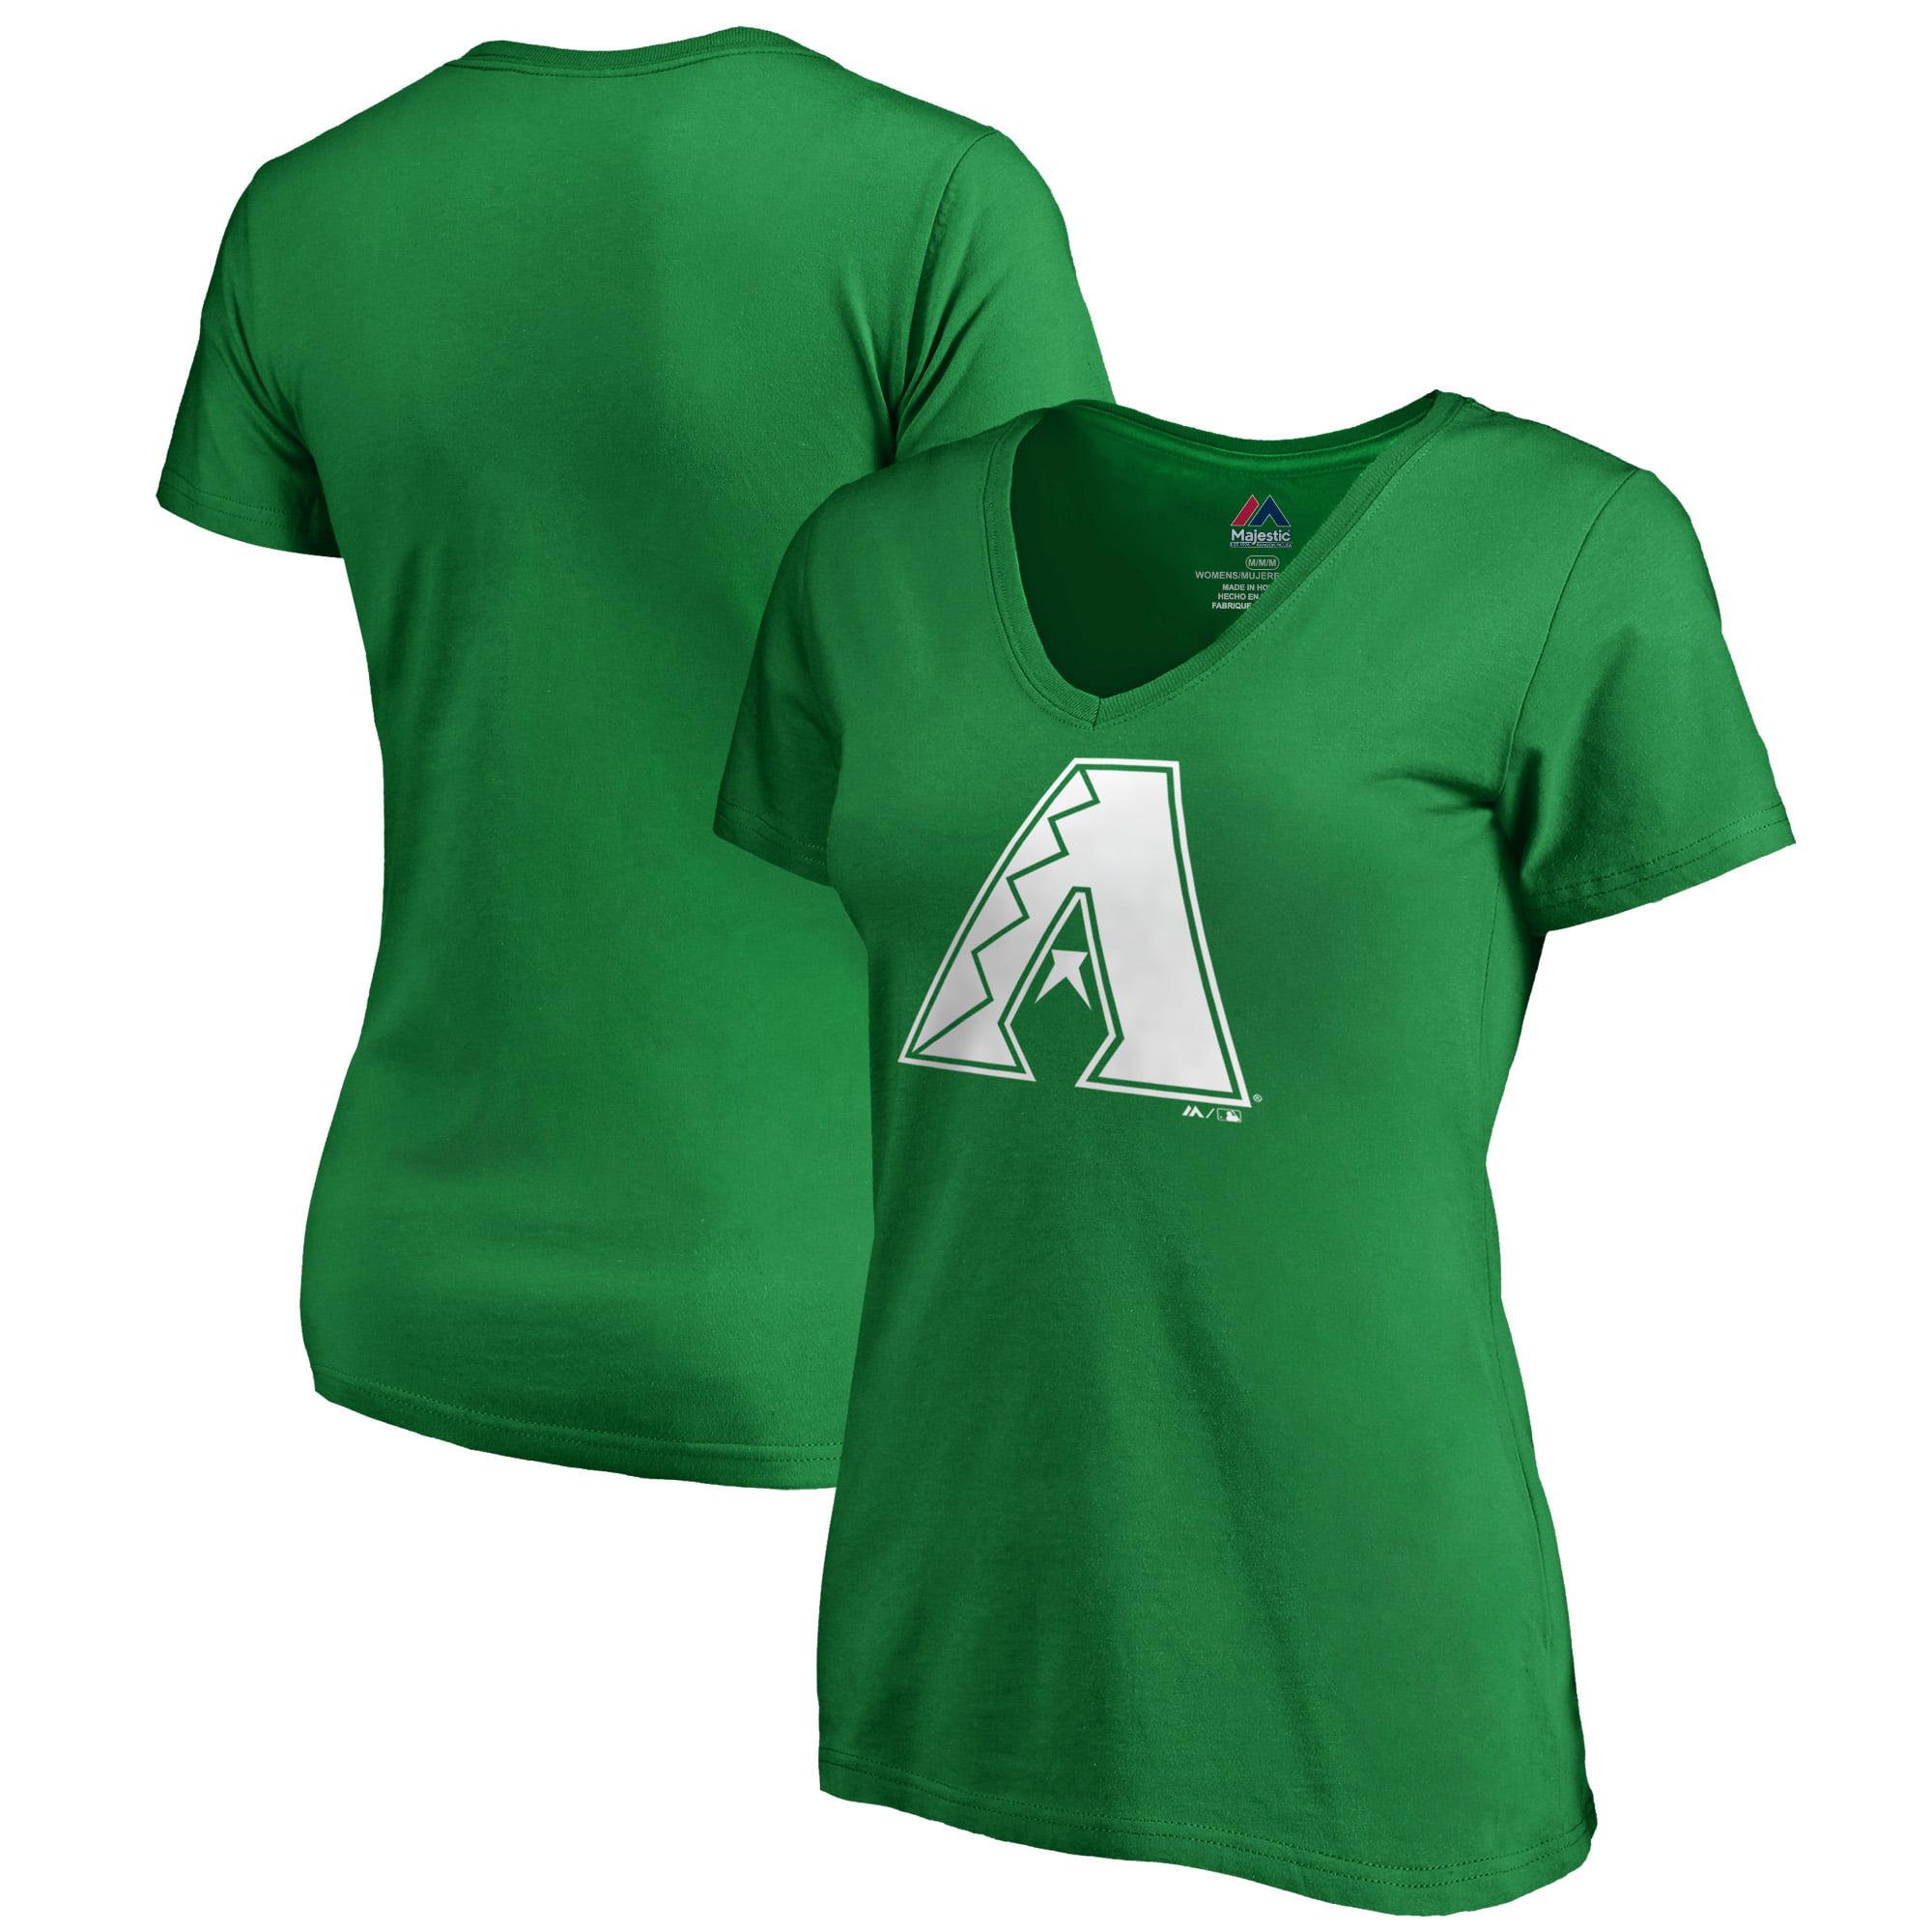 Arizona Diamondbacks Majestic Women's St. Patrick's Day White Logo V-Neck T-Shirt - Kelly Green